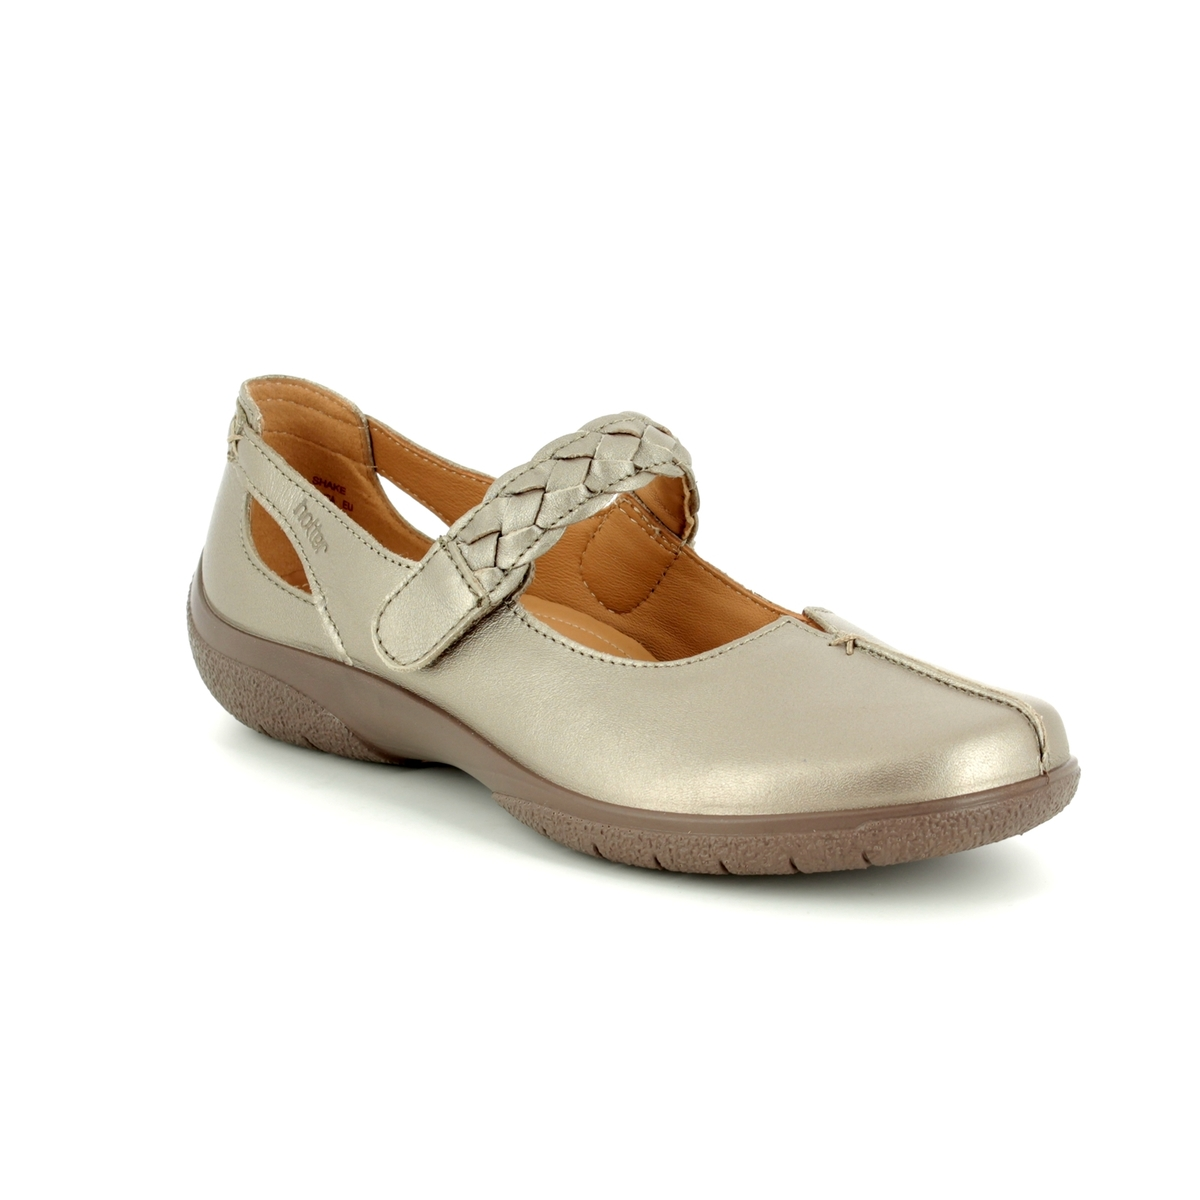 f216ca2e274 Hotter Mary Jane Shoes - Metallic - 8111 01 SHAKE E FIT